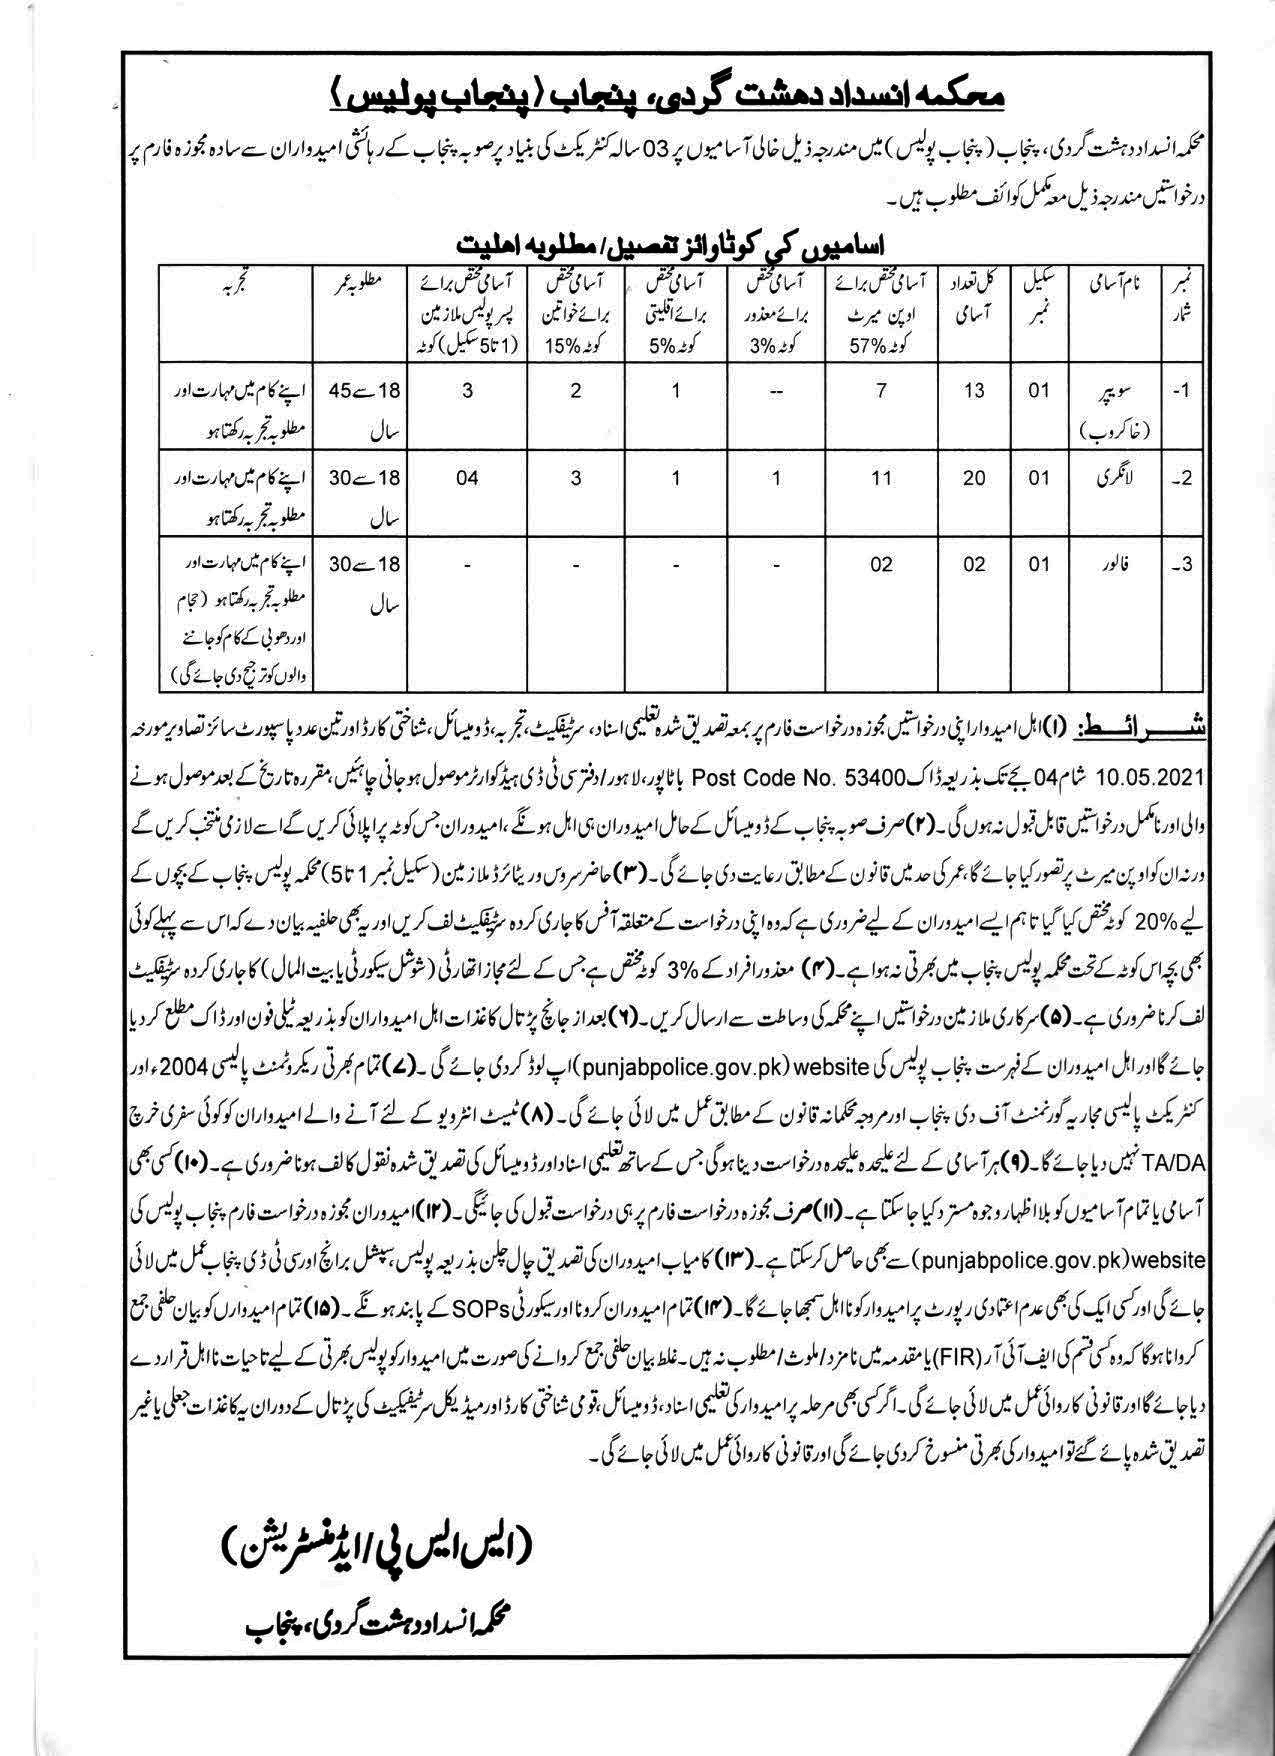 CTD Punjab Police Jobs 2021